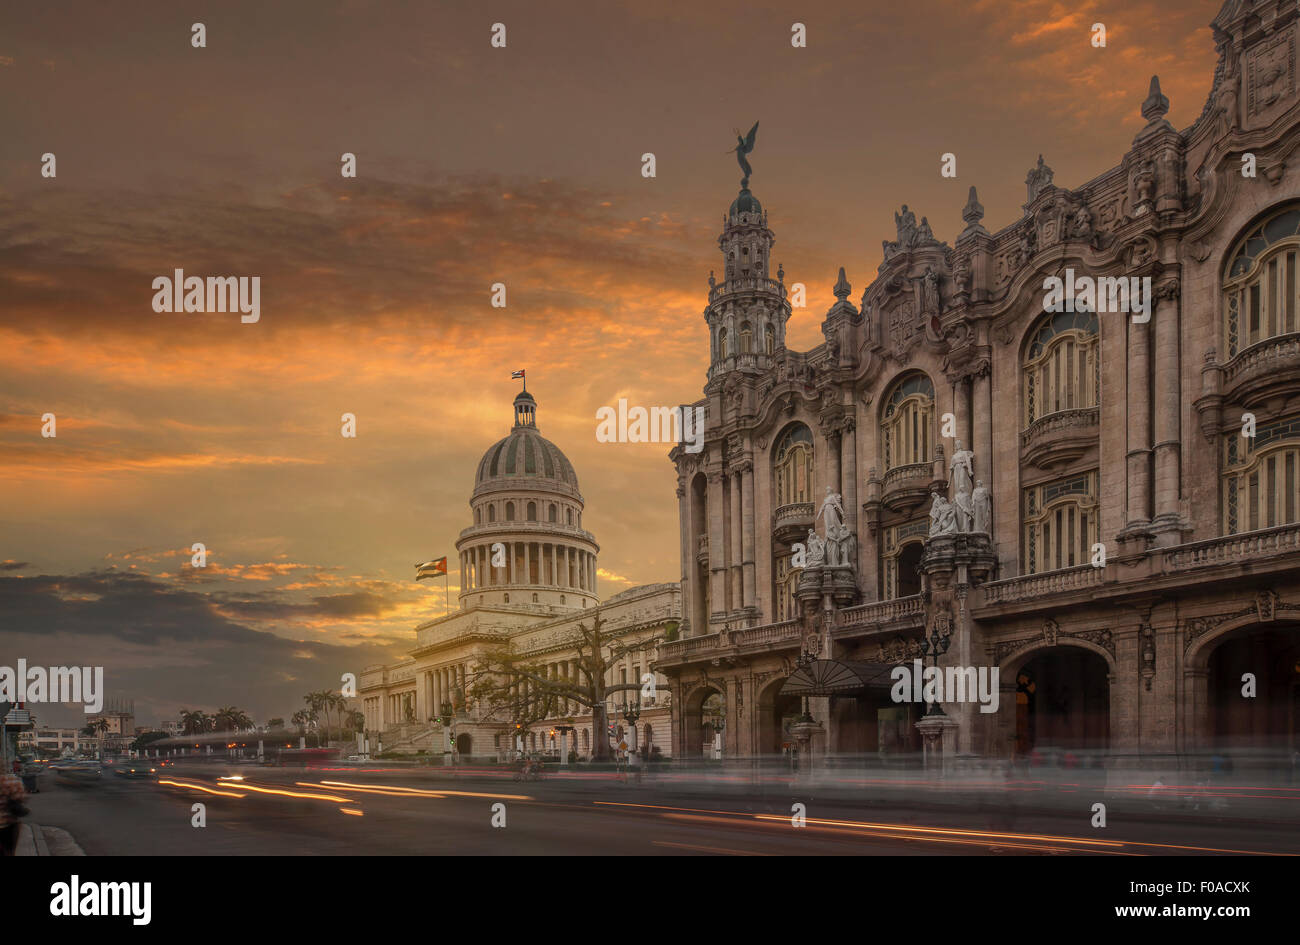 Das Kapitol und das Nationaltheater bei Sonnenuntergang, Havanna, Kuba Stockbild